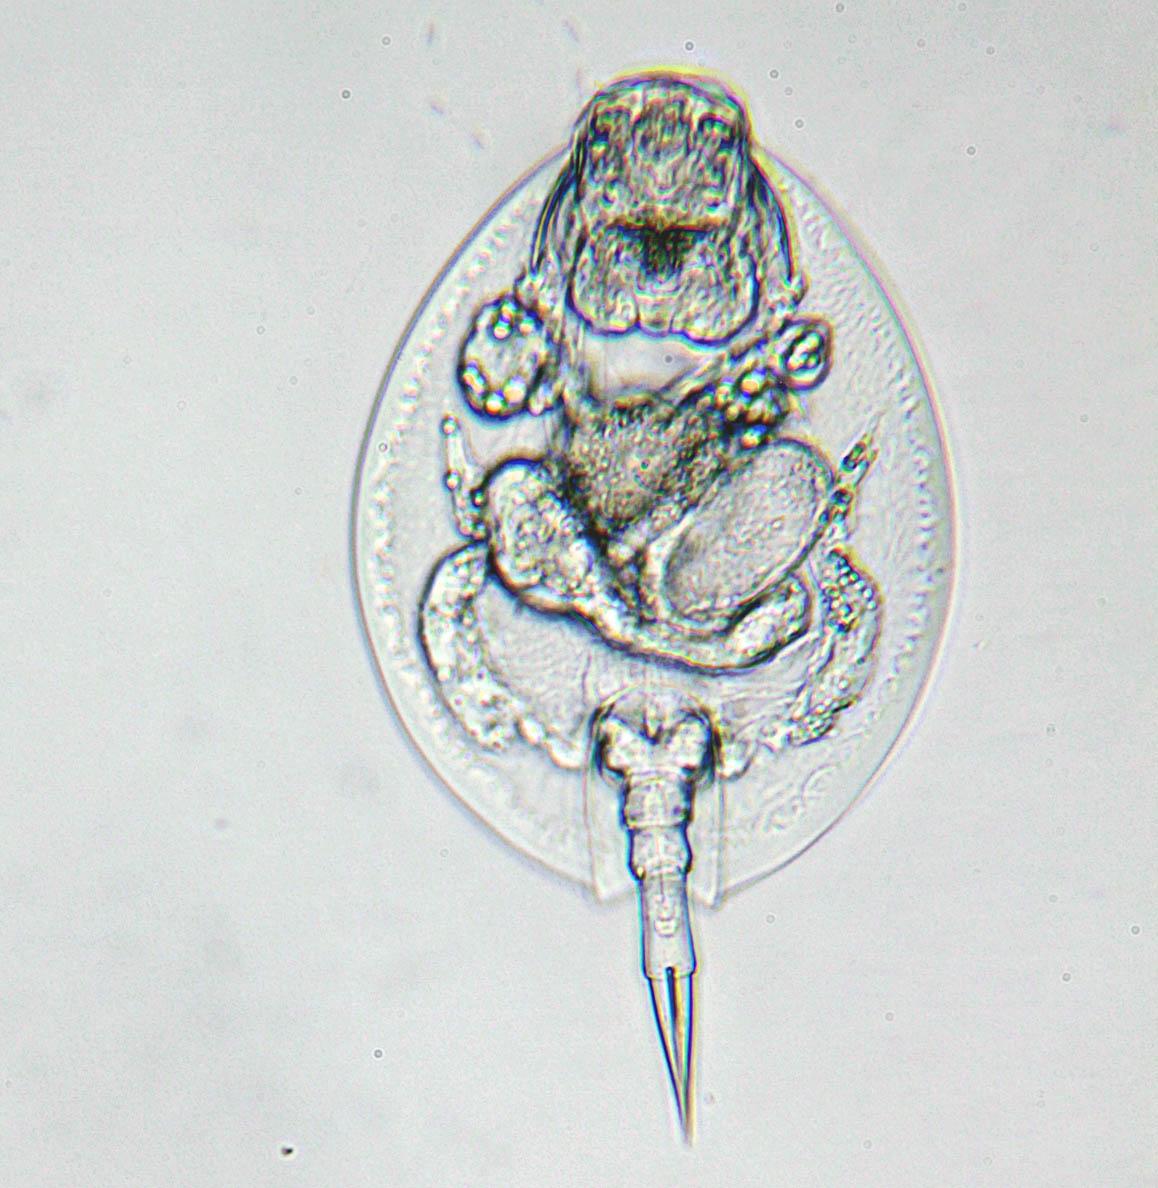 Lepadella spec. (L. ovalis?)